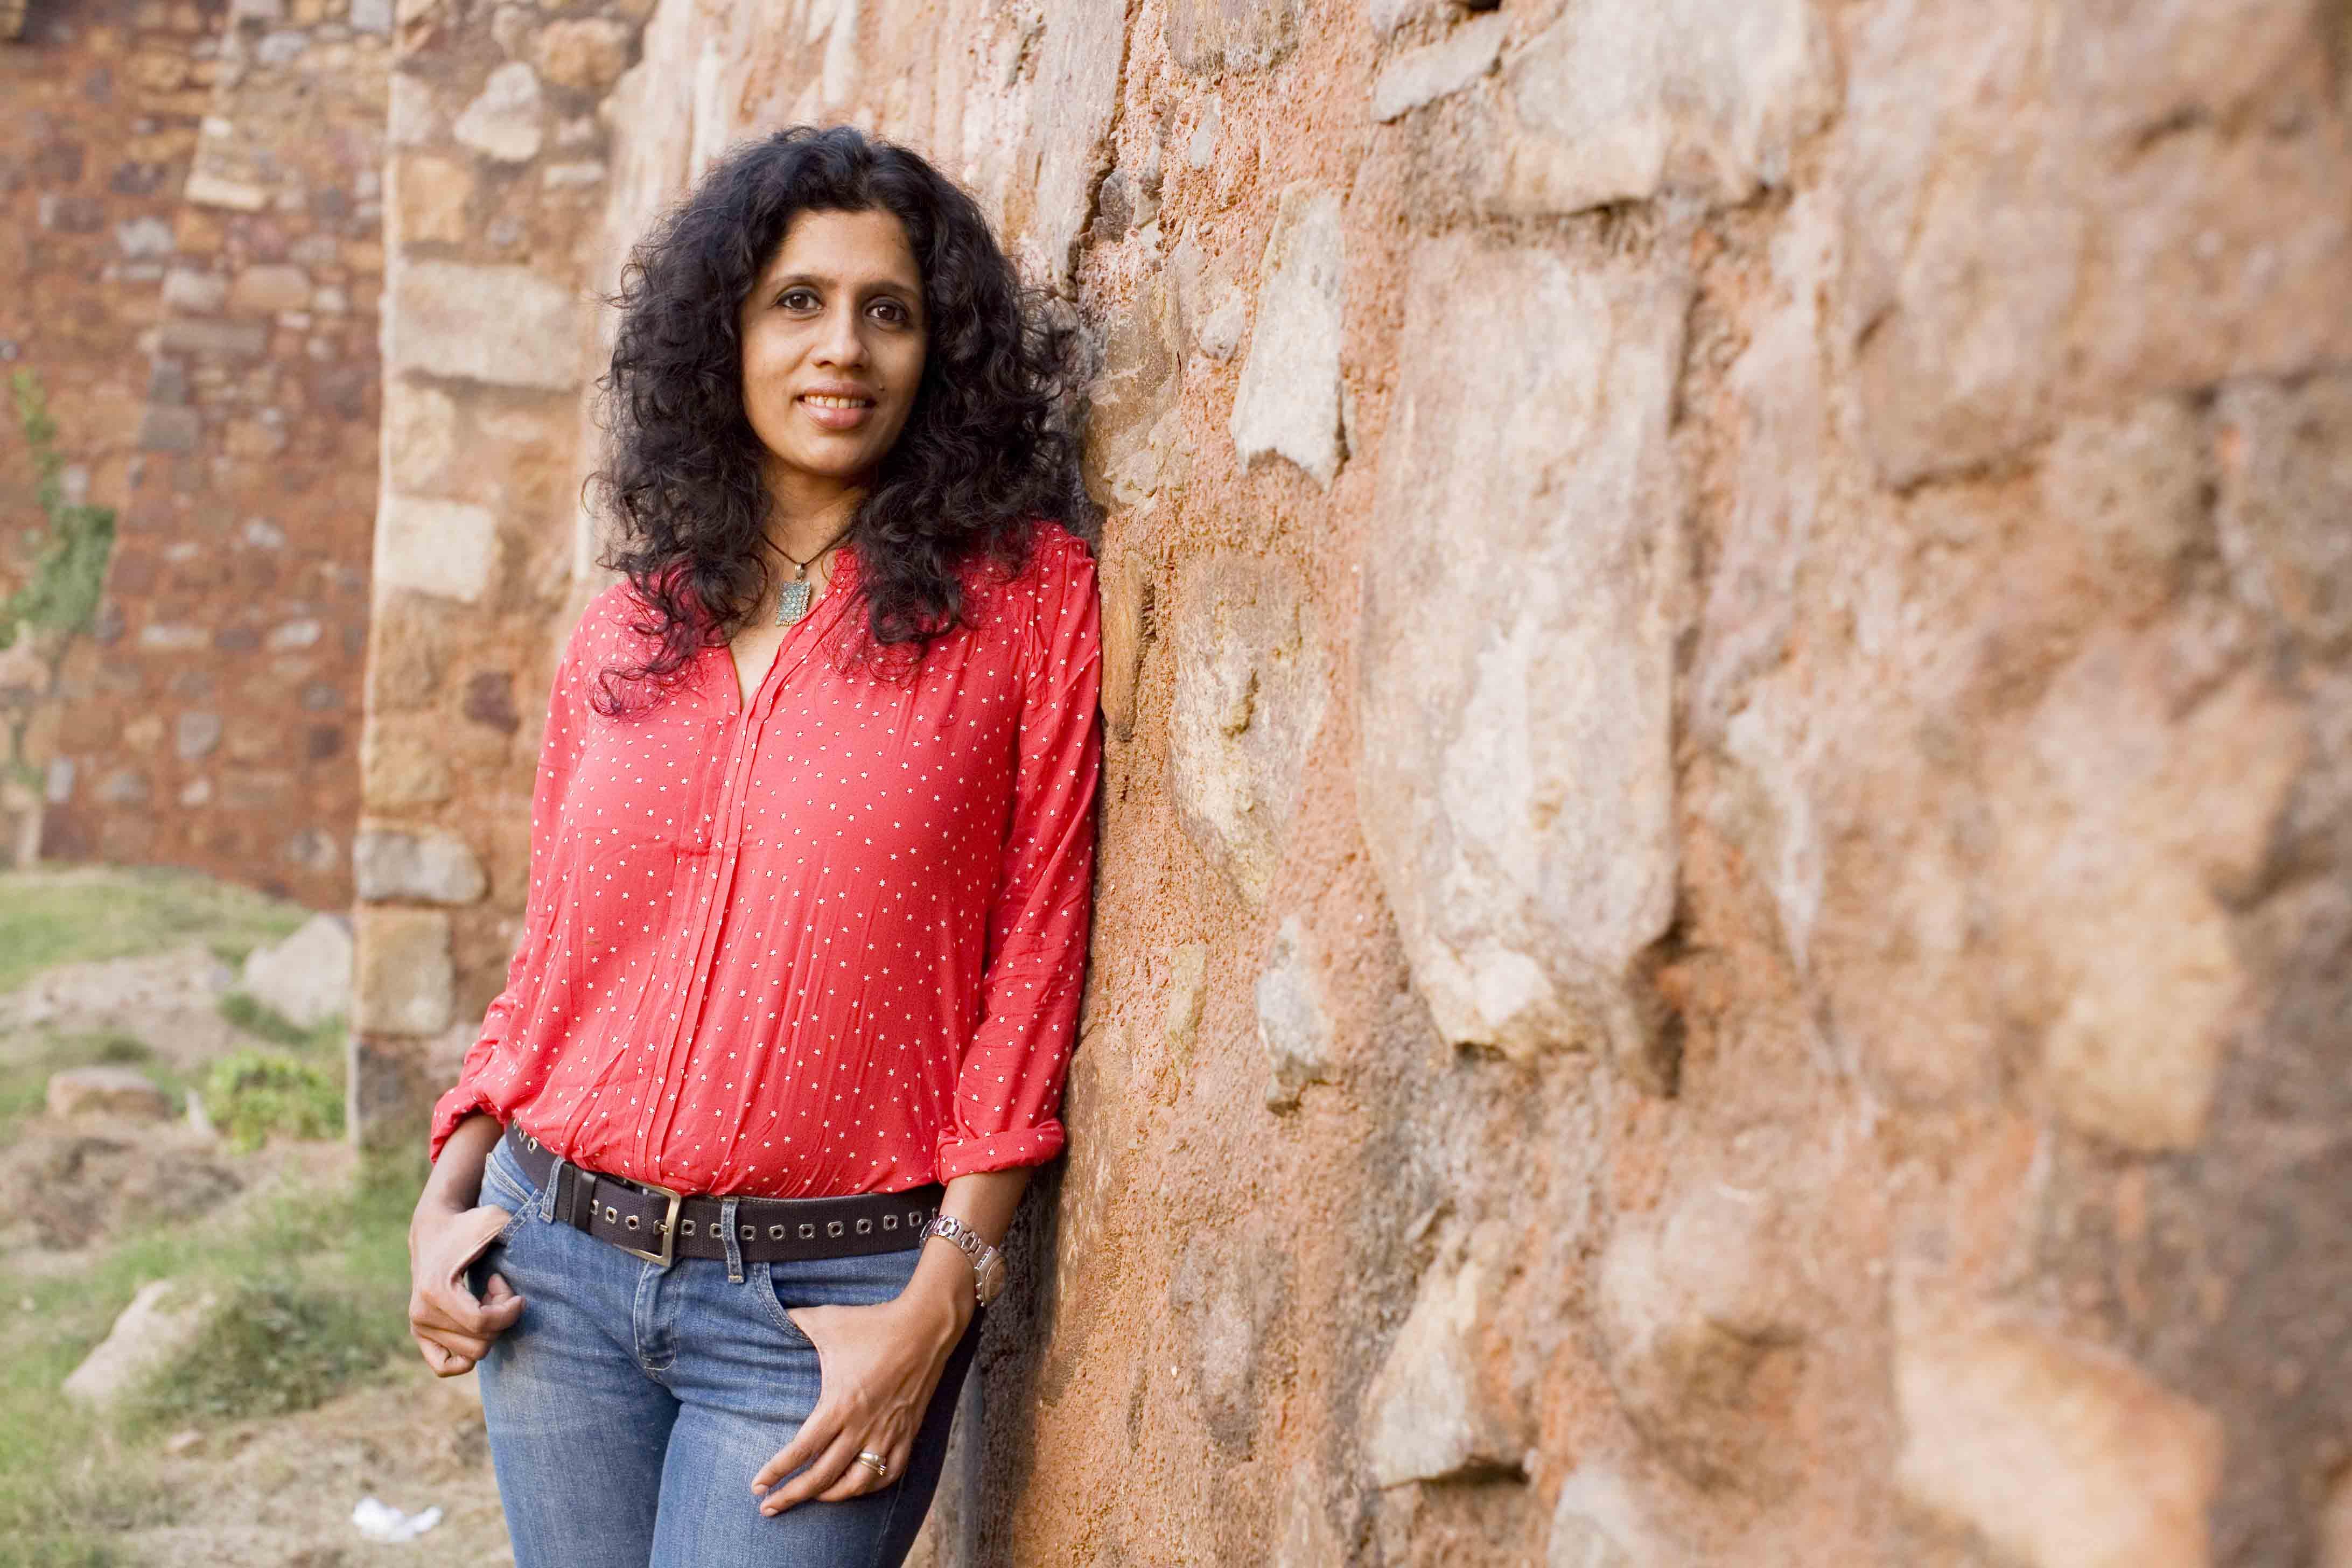 Our Self-Written Obituaries – Veena Venugopal, Sector 42, Gurgaon